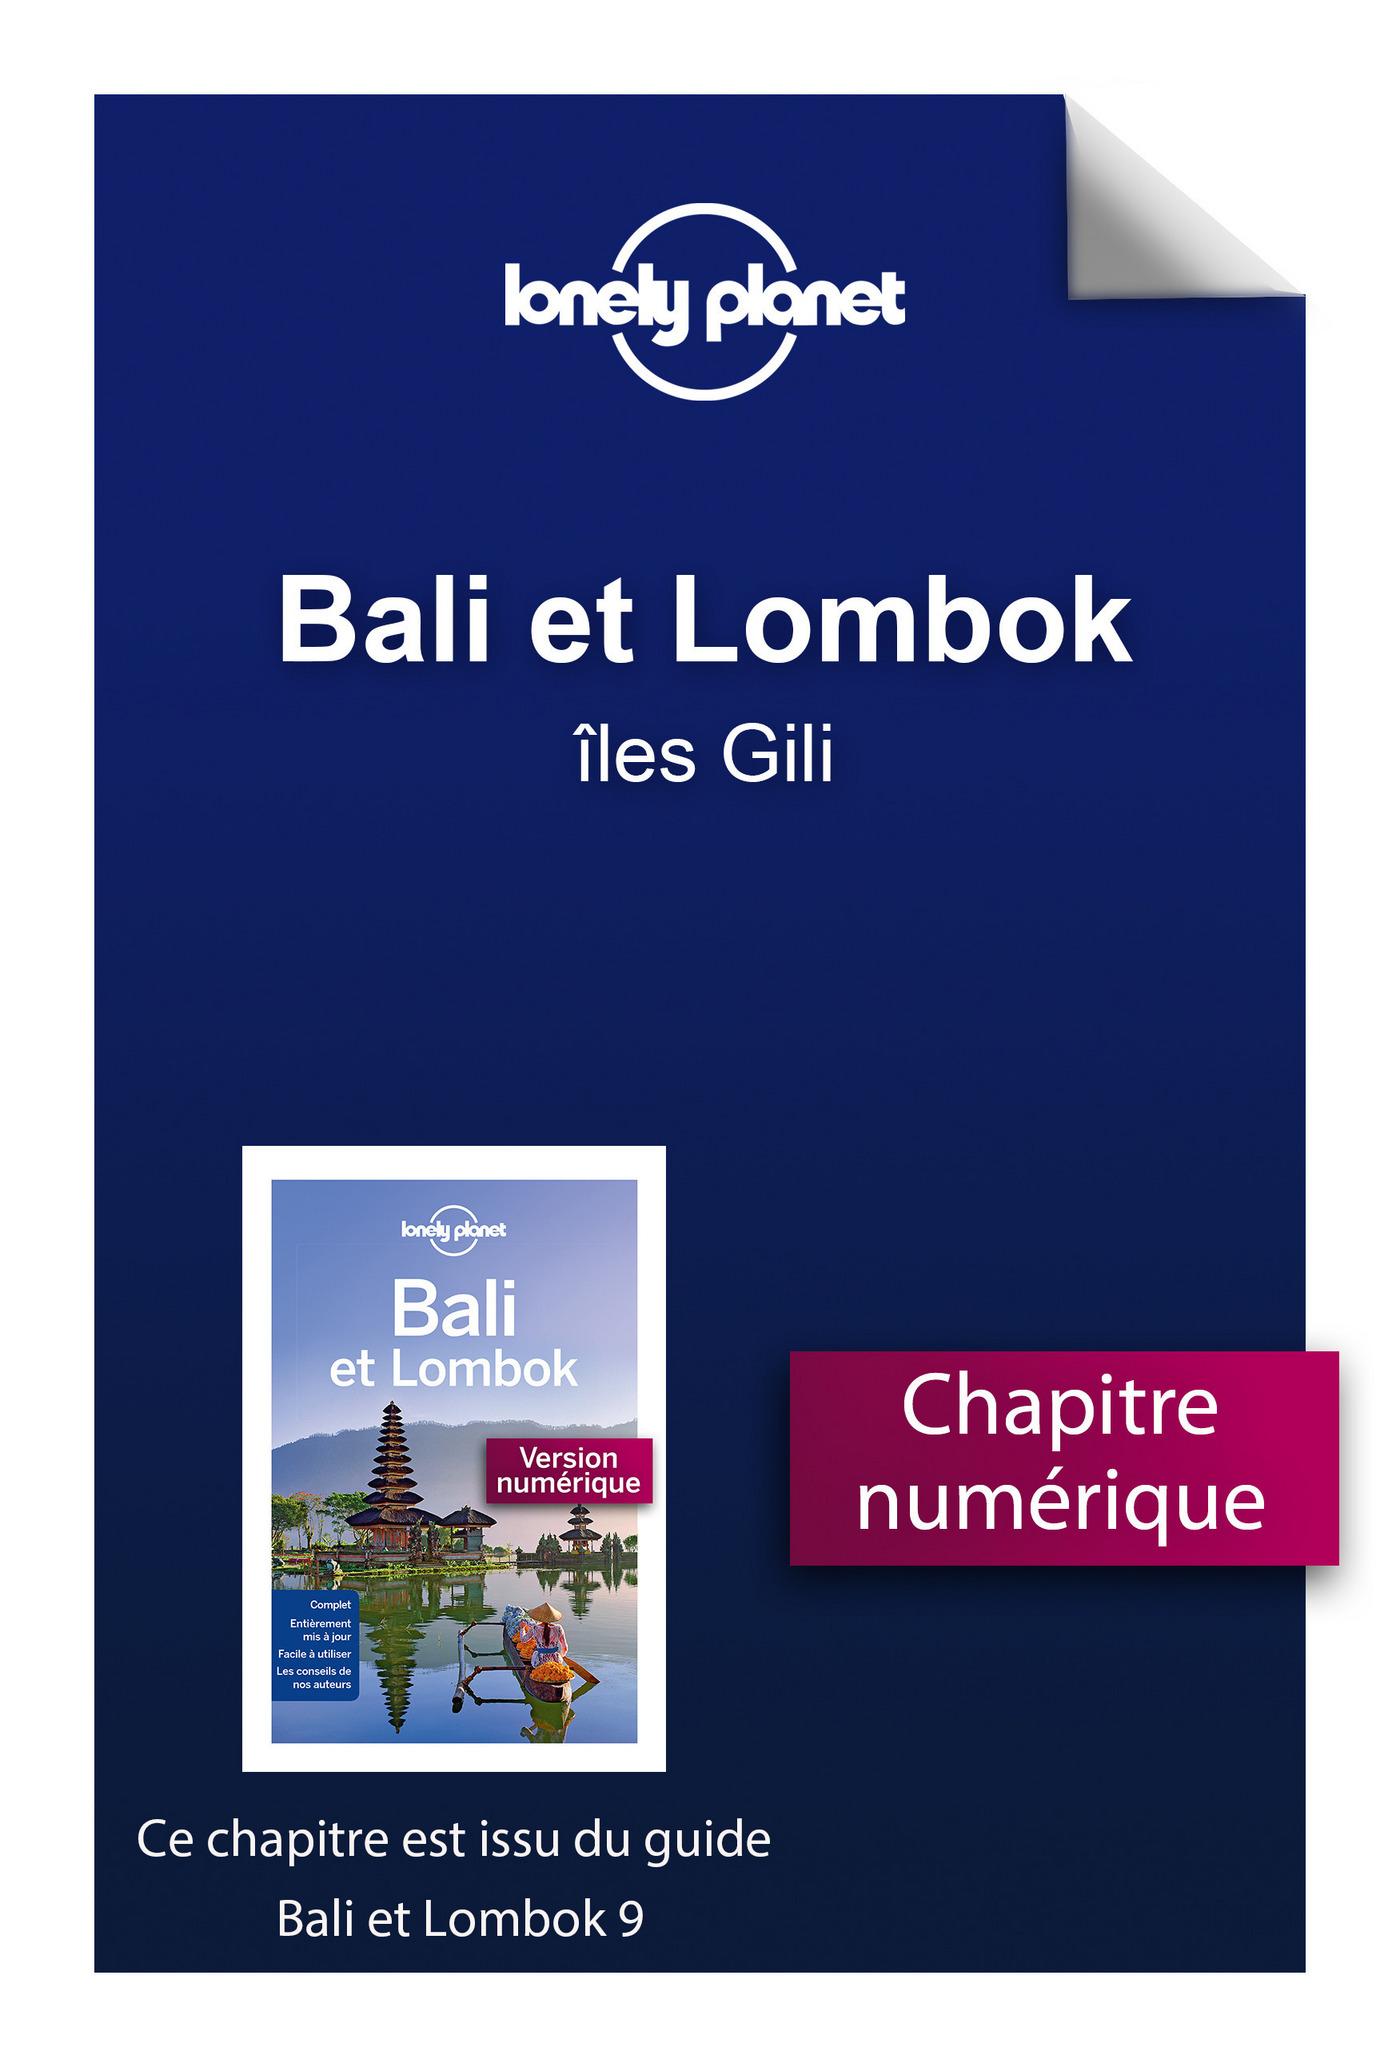 Bali et Lombok 9 - îles Gili